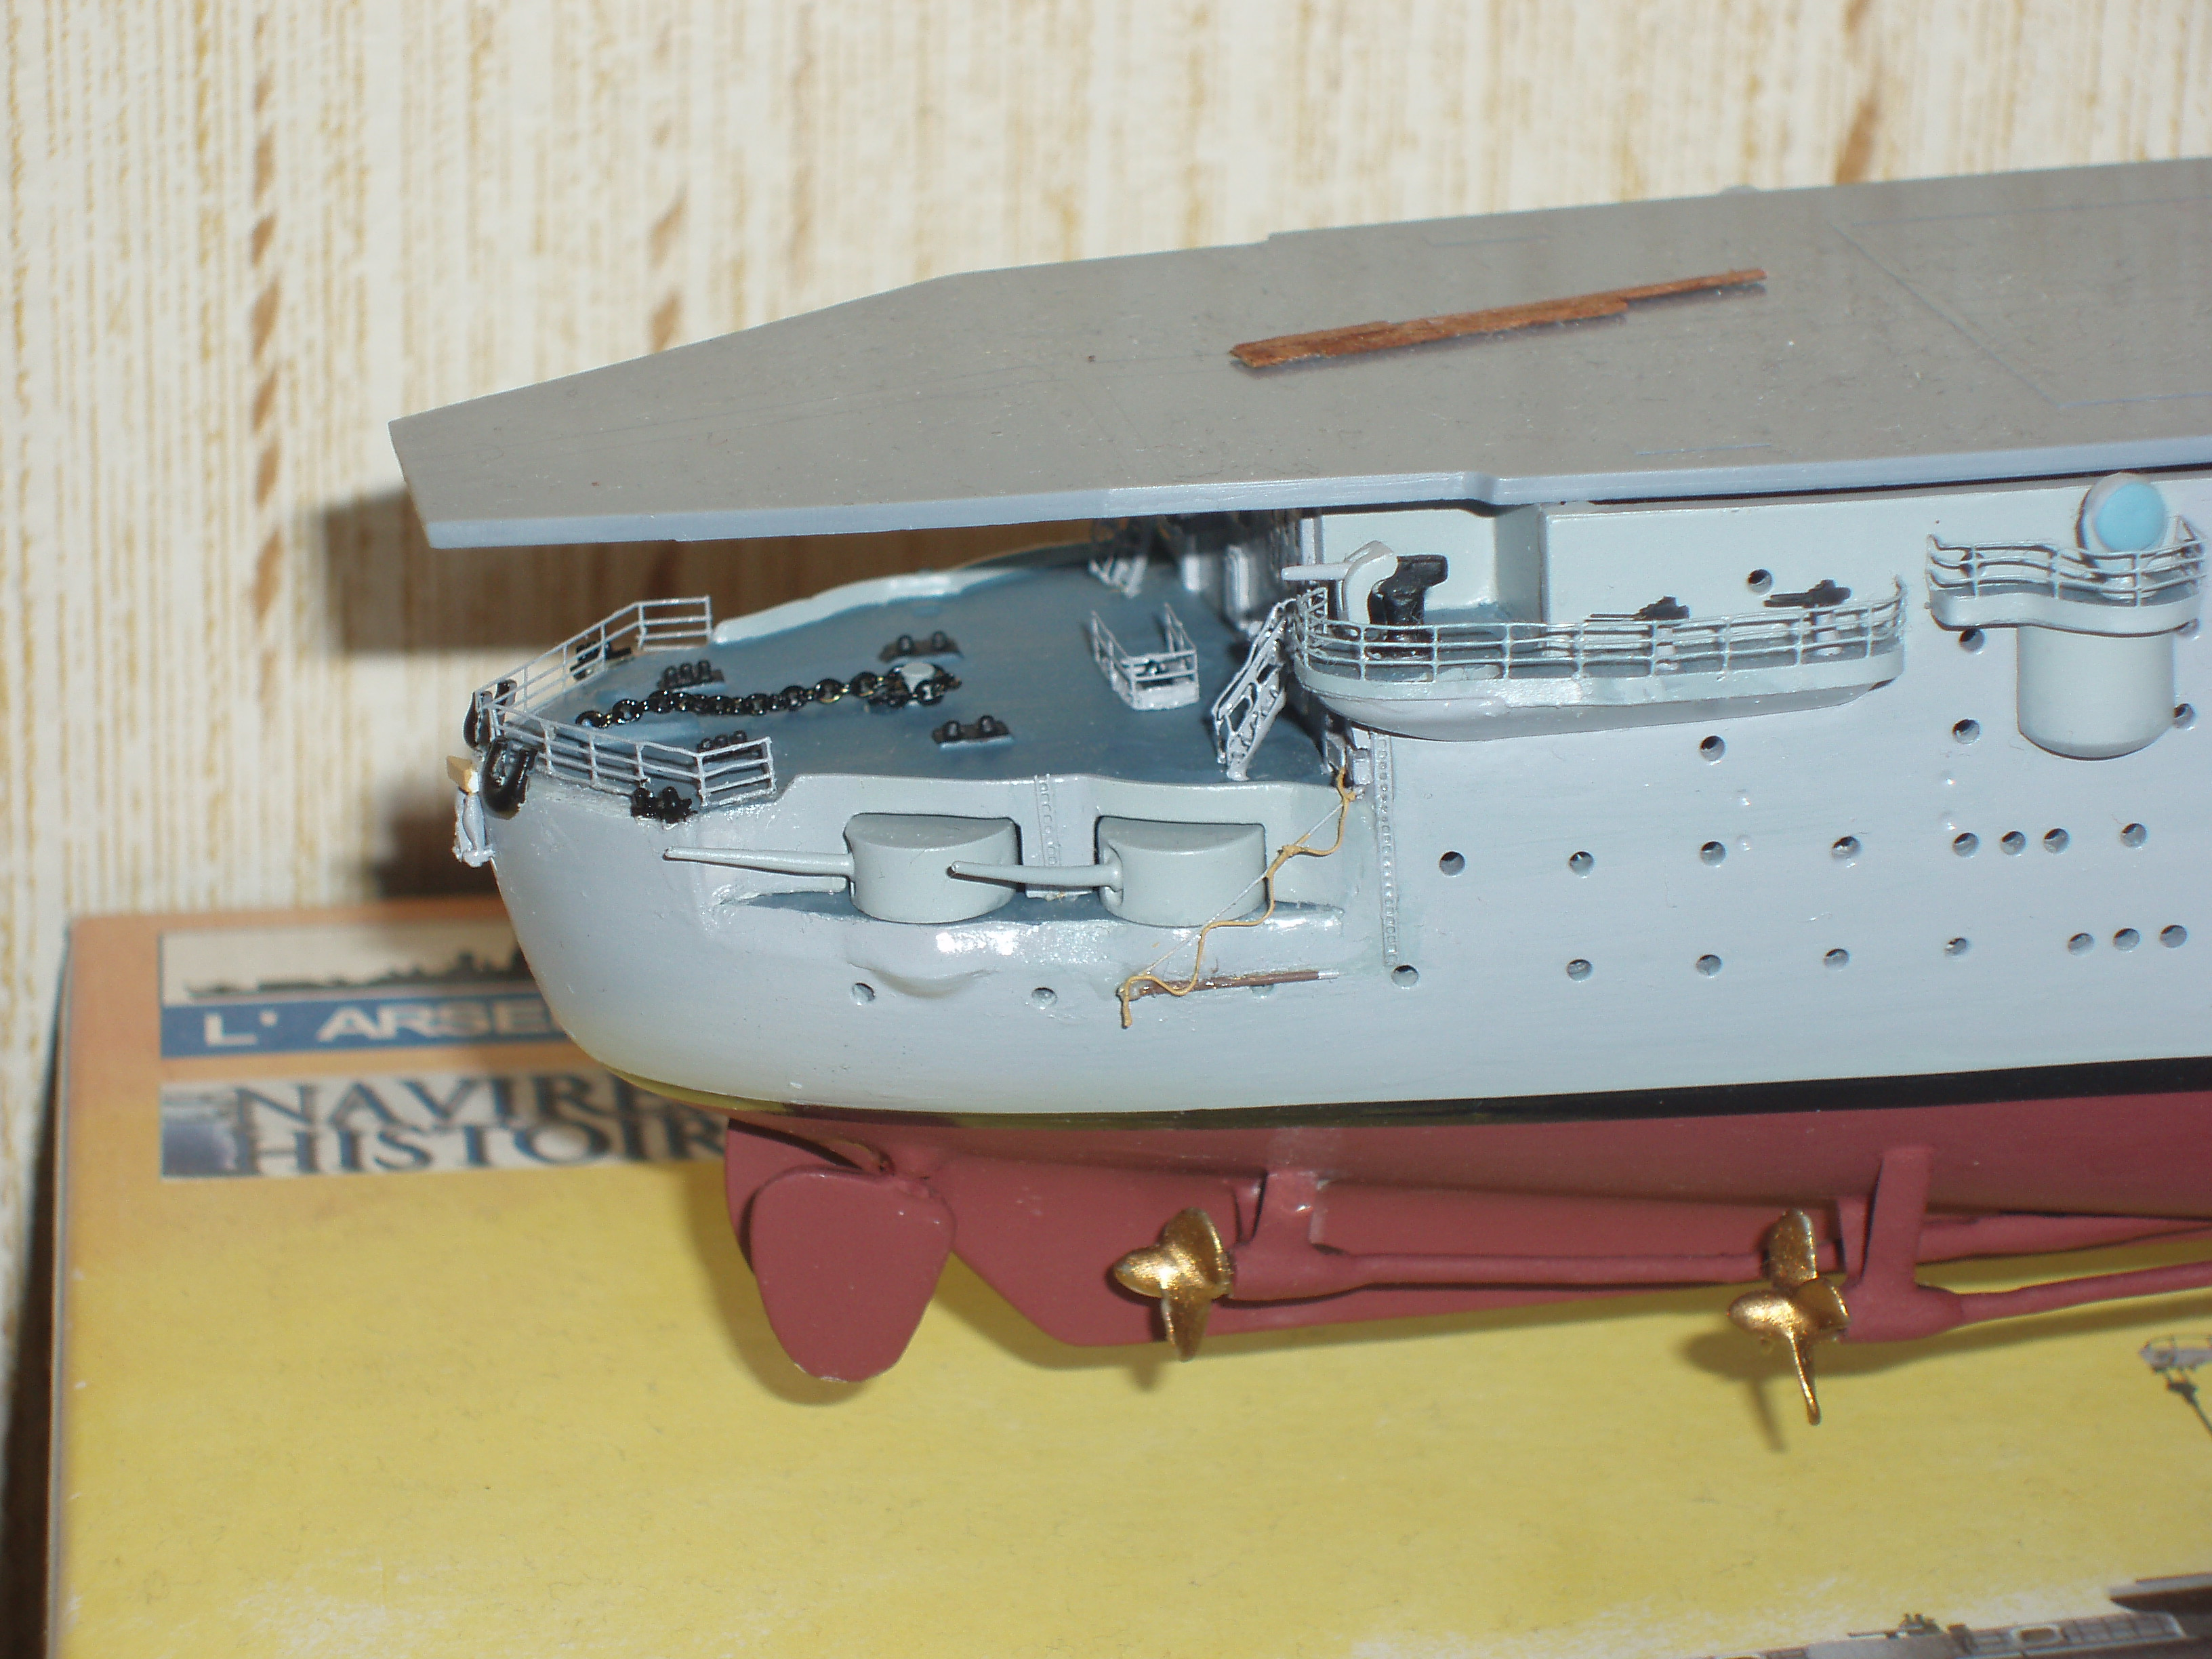 Le porte avions BEARN de l' ARSENAL 556283Photo001